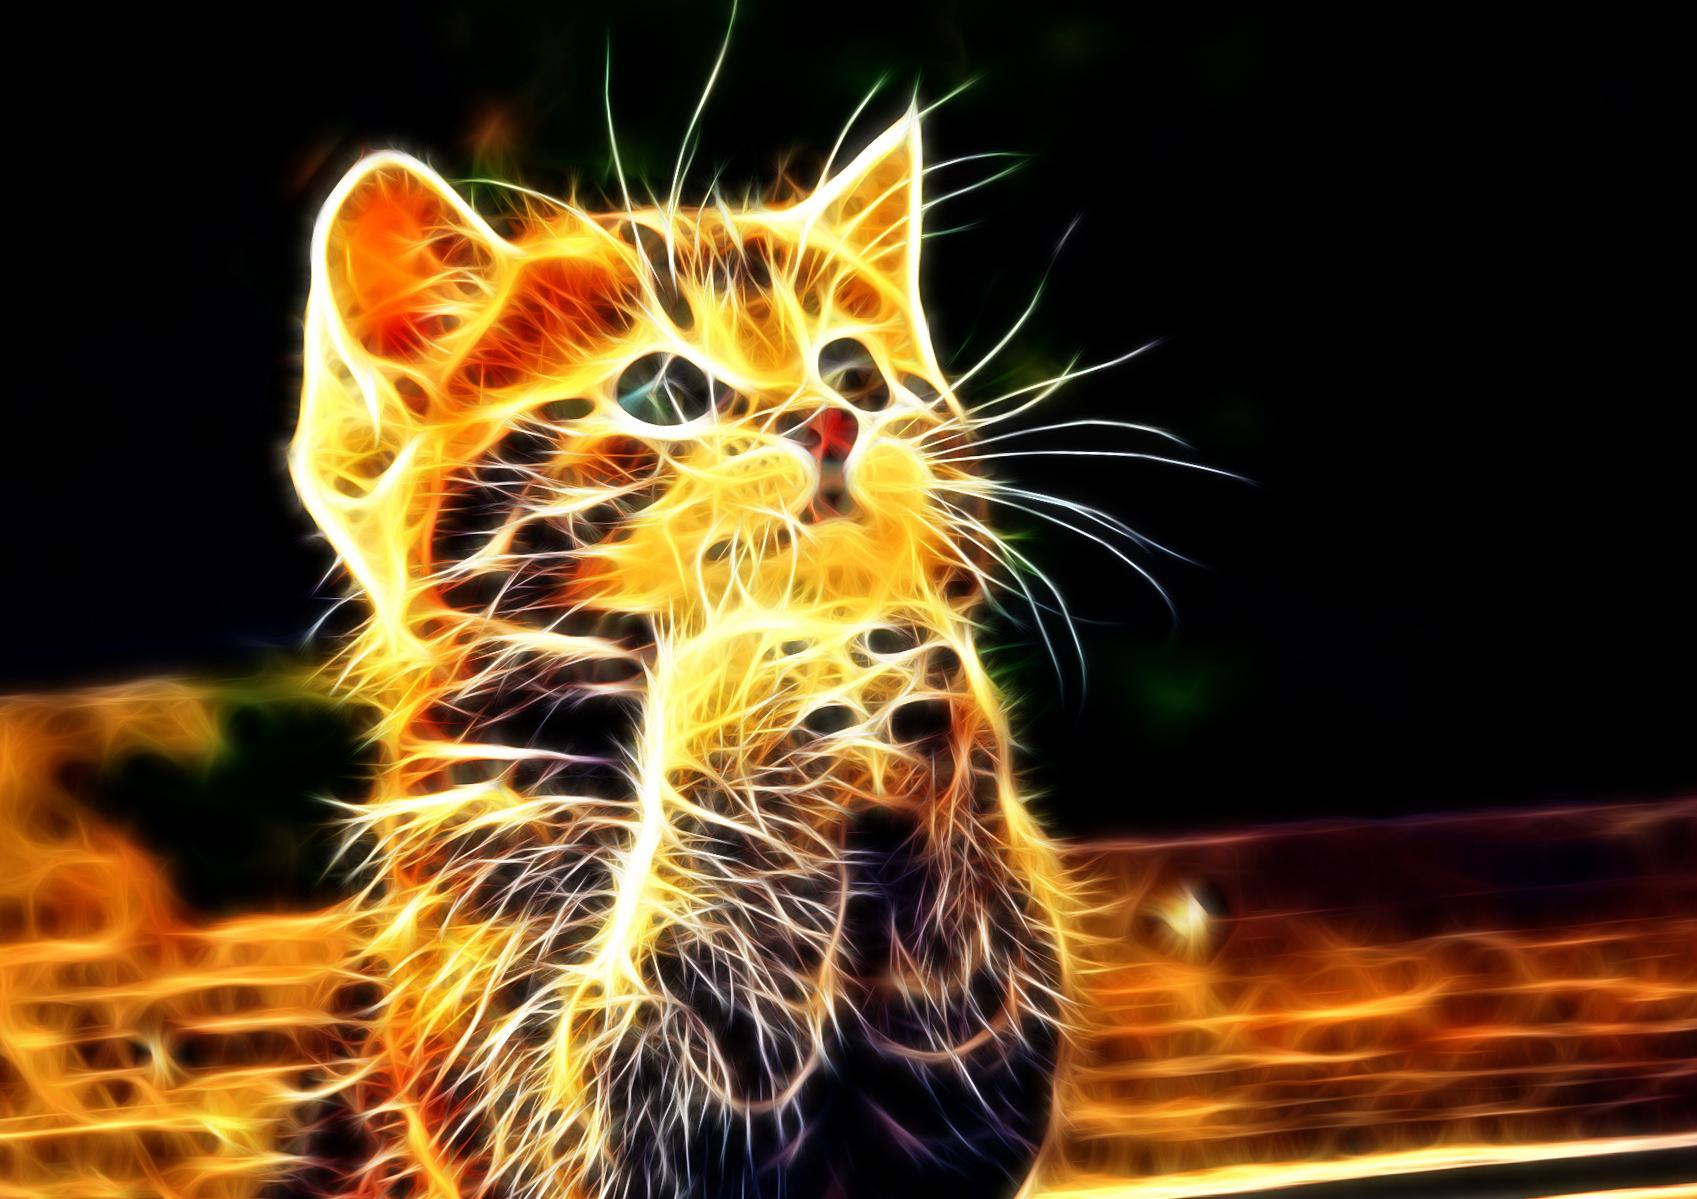 22725 Animals 3d Wallpapers For Desktop Cool Backgrounds Of Animals 2133342 Hd Wallpaper Backgrounds Download